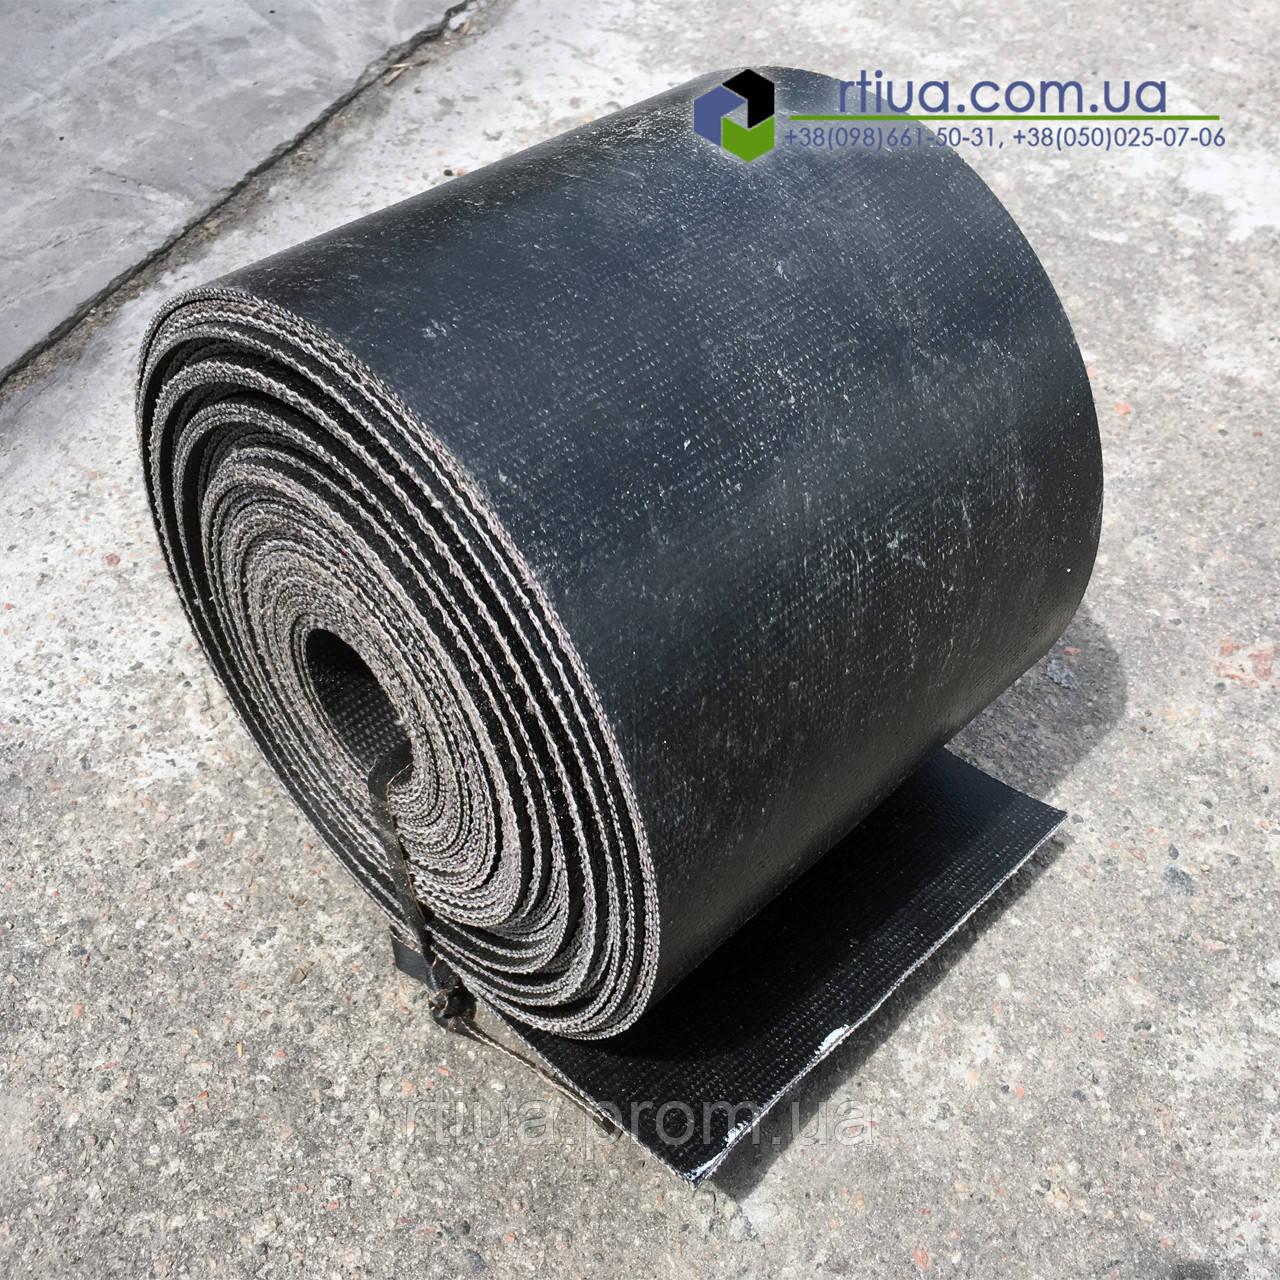 Транспортерная лента ТК-200, 1000х3 - 3/1 (7 мм)